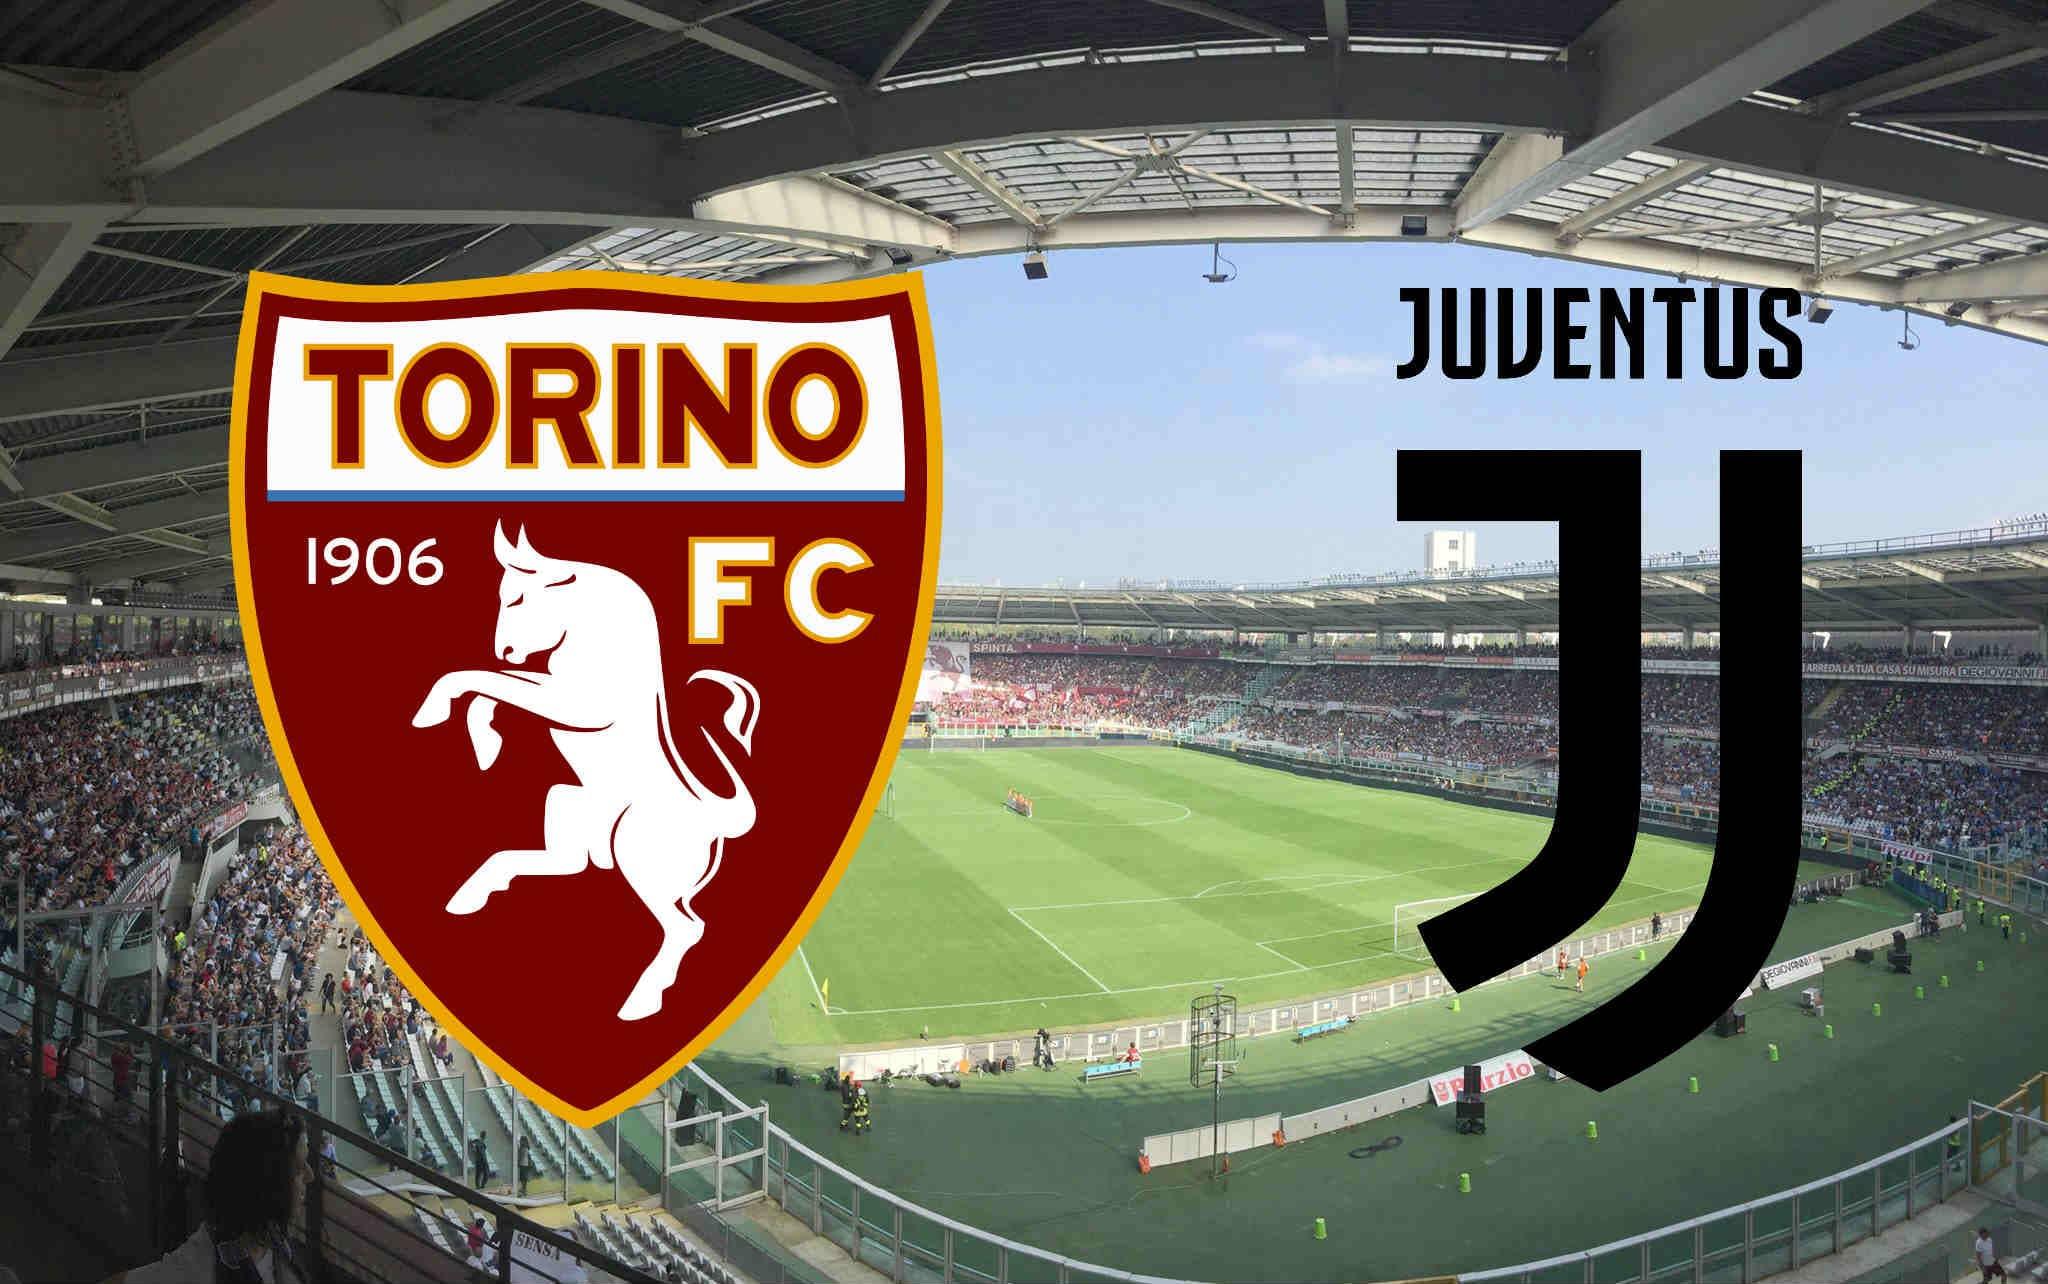 Торино – Ювентус: прогноз матча 2 ноября 2019